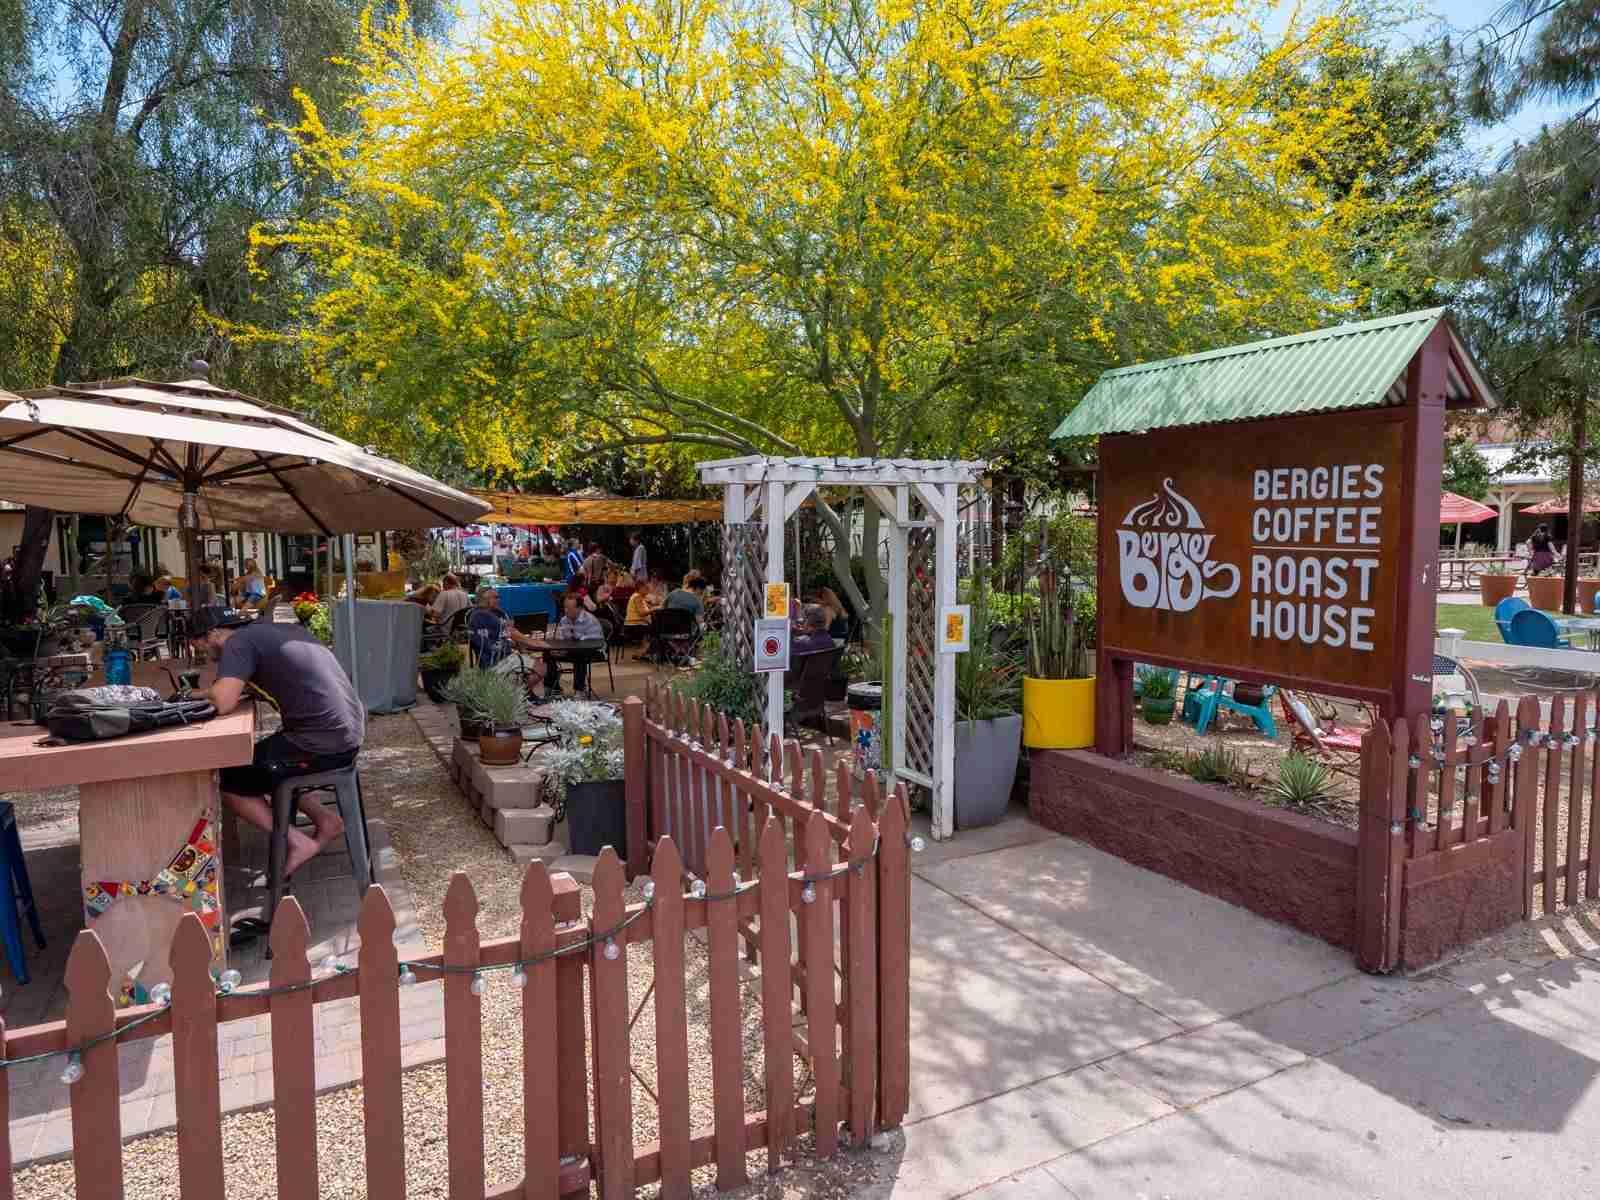 Top 5 Coffee Shops in Gilbert, Arizona - Brooksy